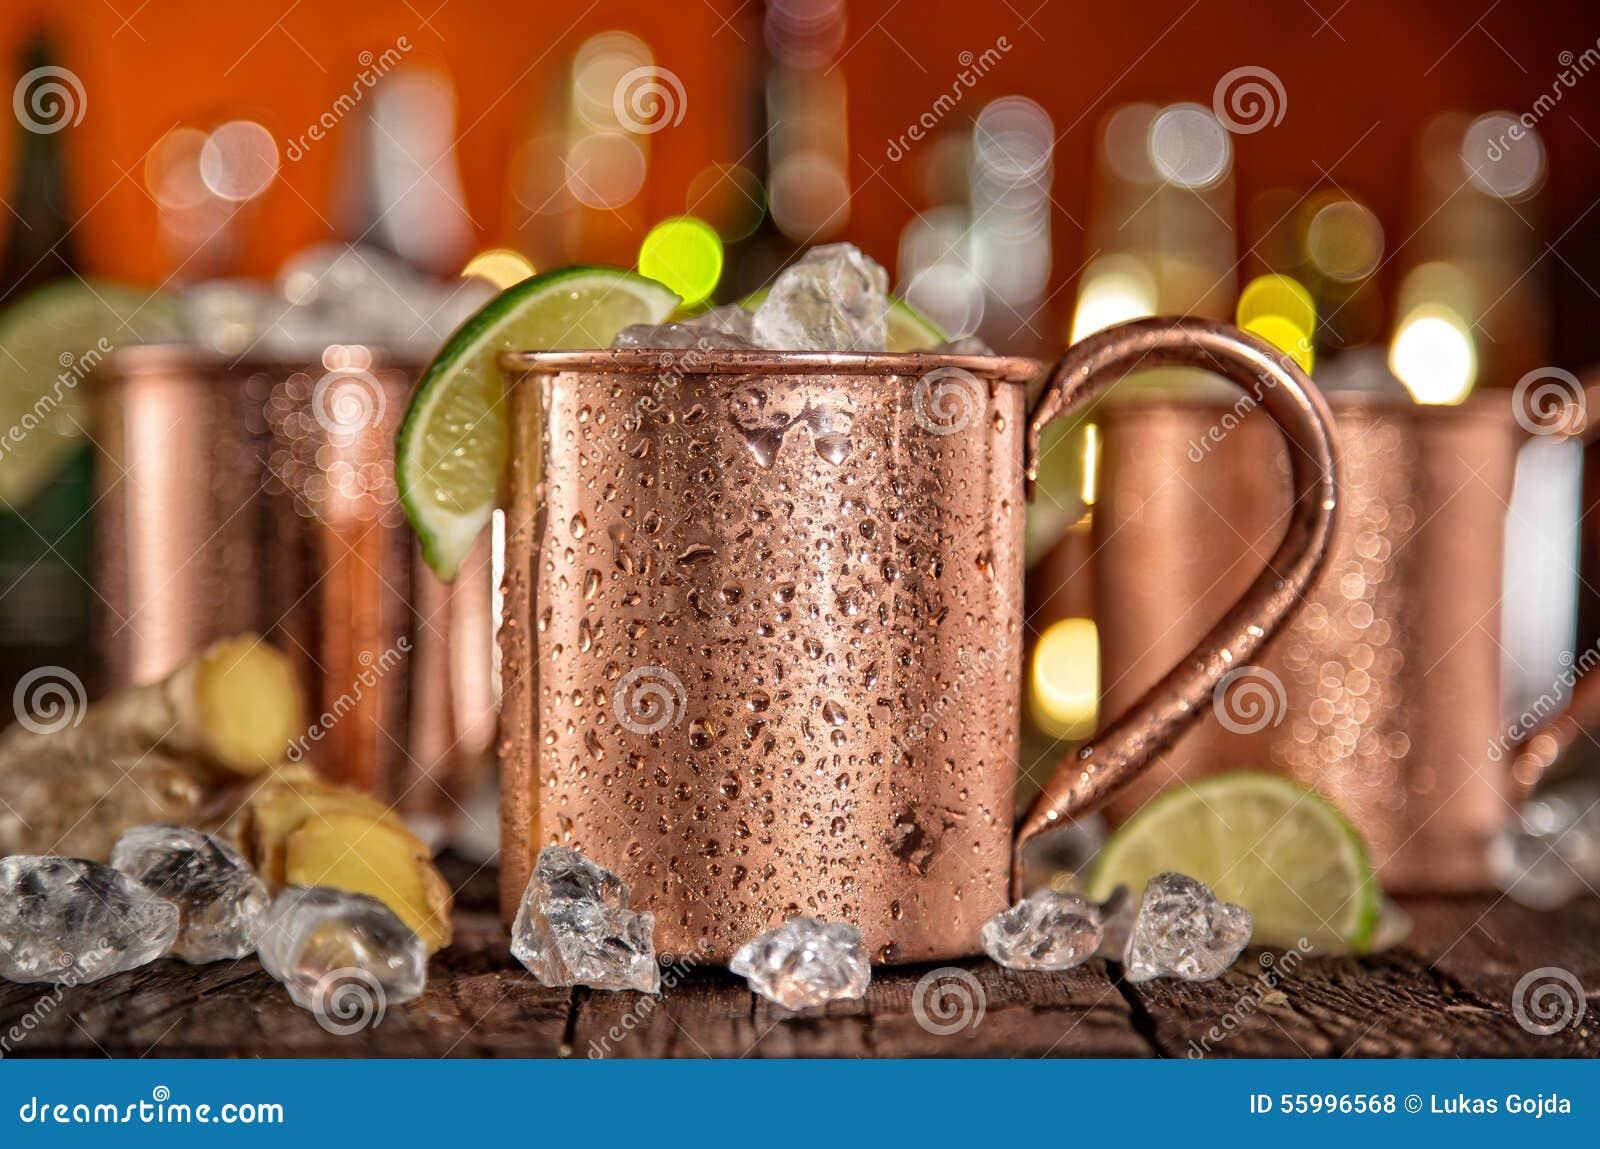 Muli freddi di Mosca - Ginger Beer, calce e vodka